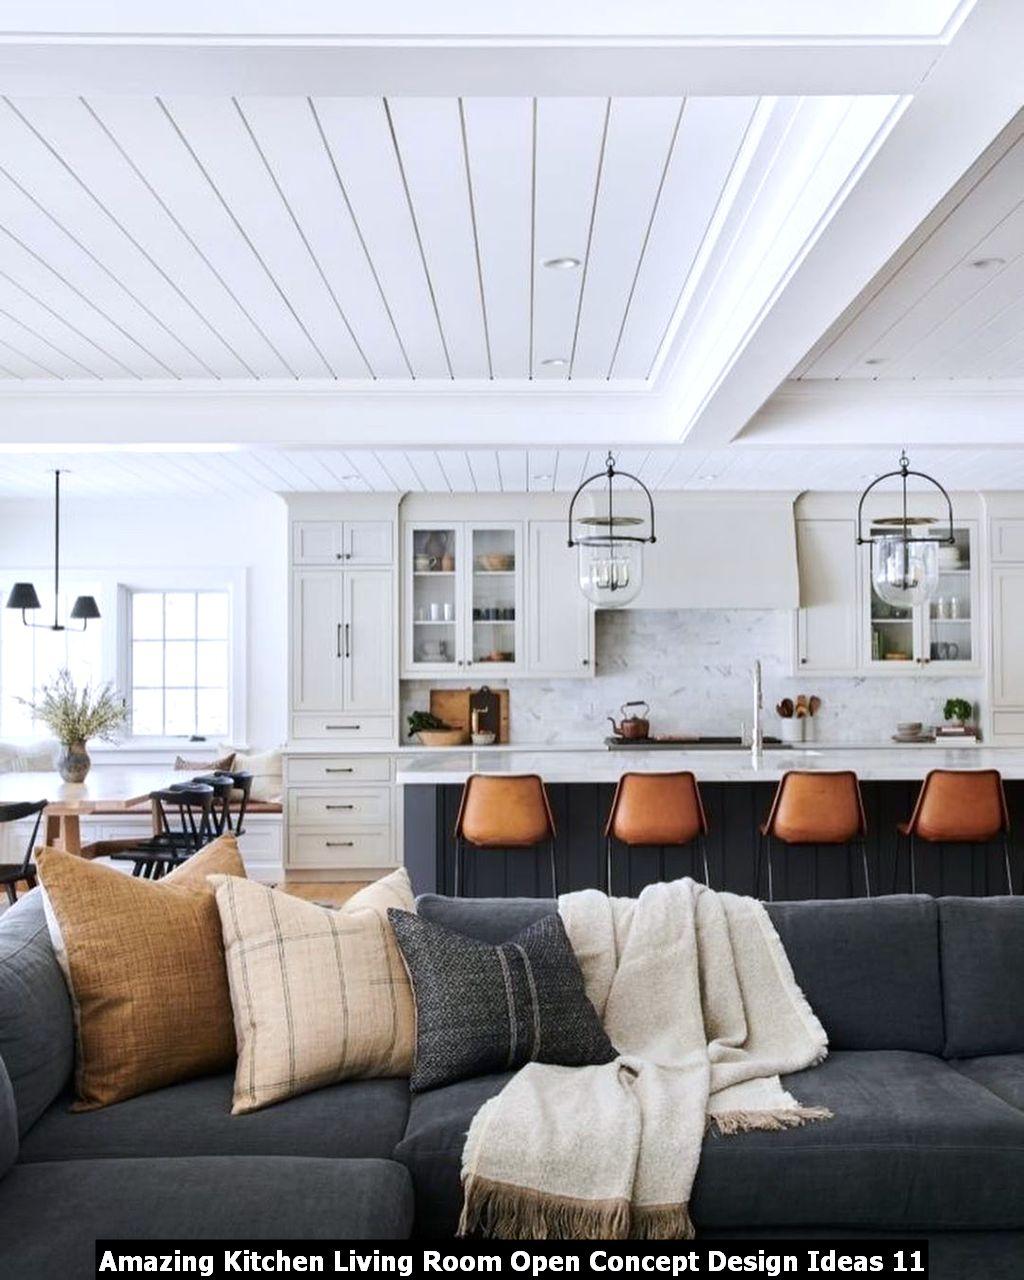 Amazing Kitchen Living Room Open Concept Design Ideas 11